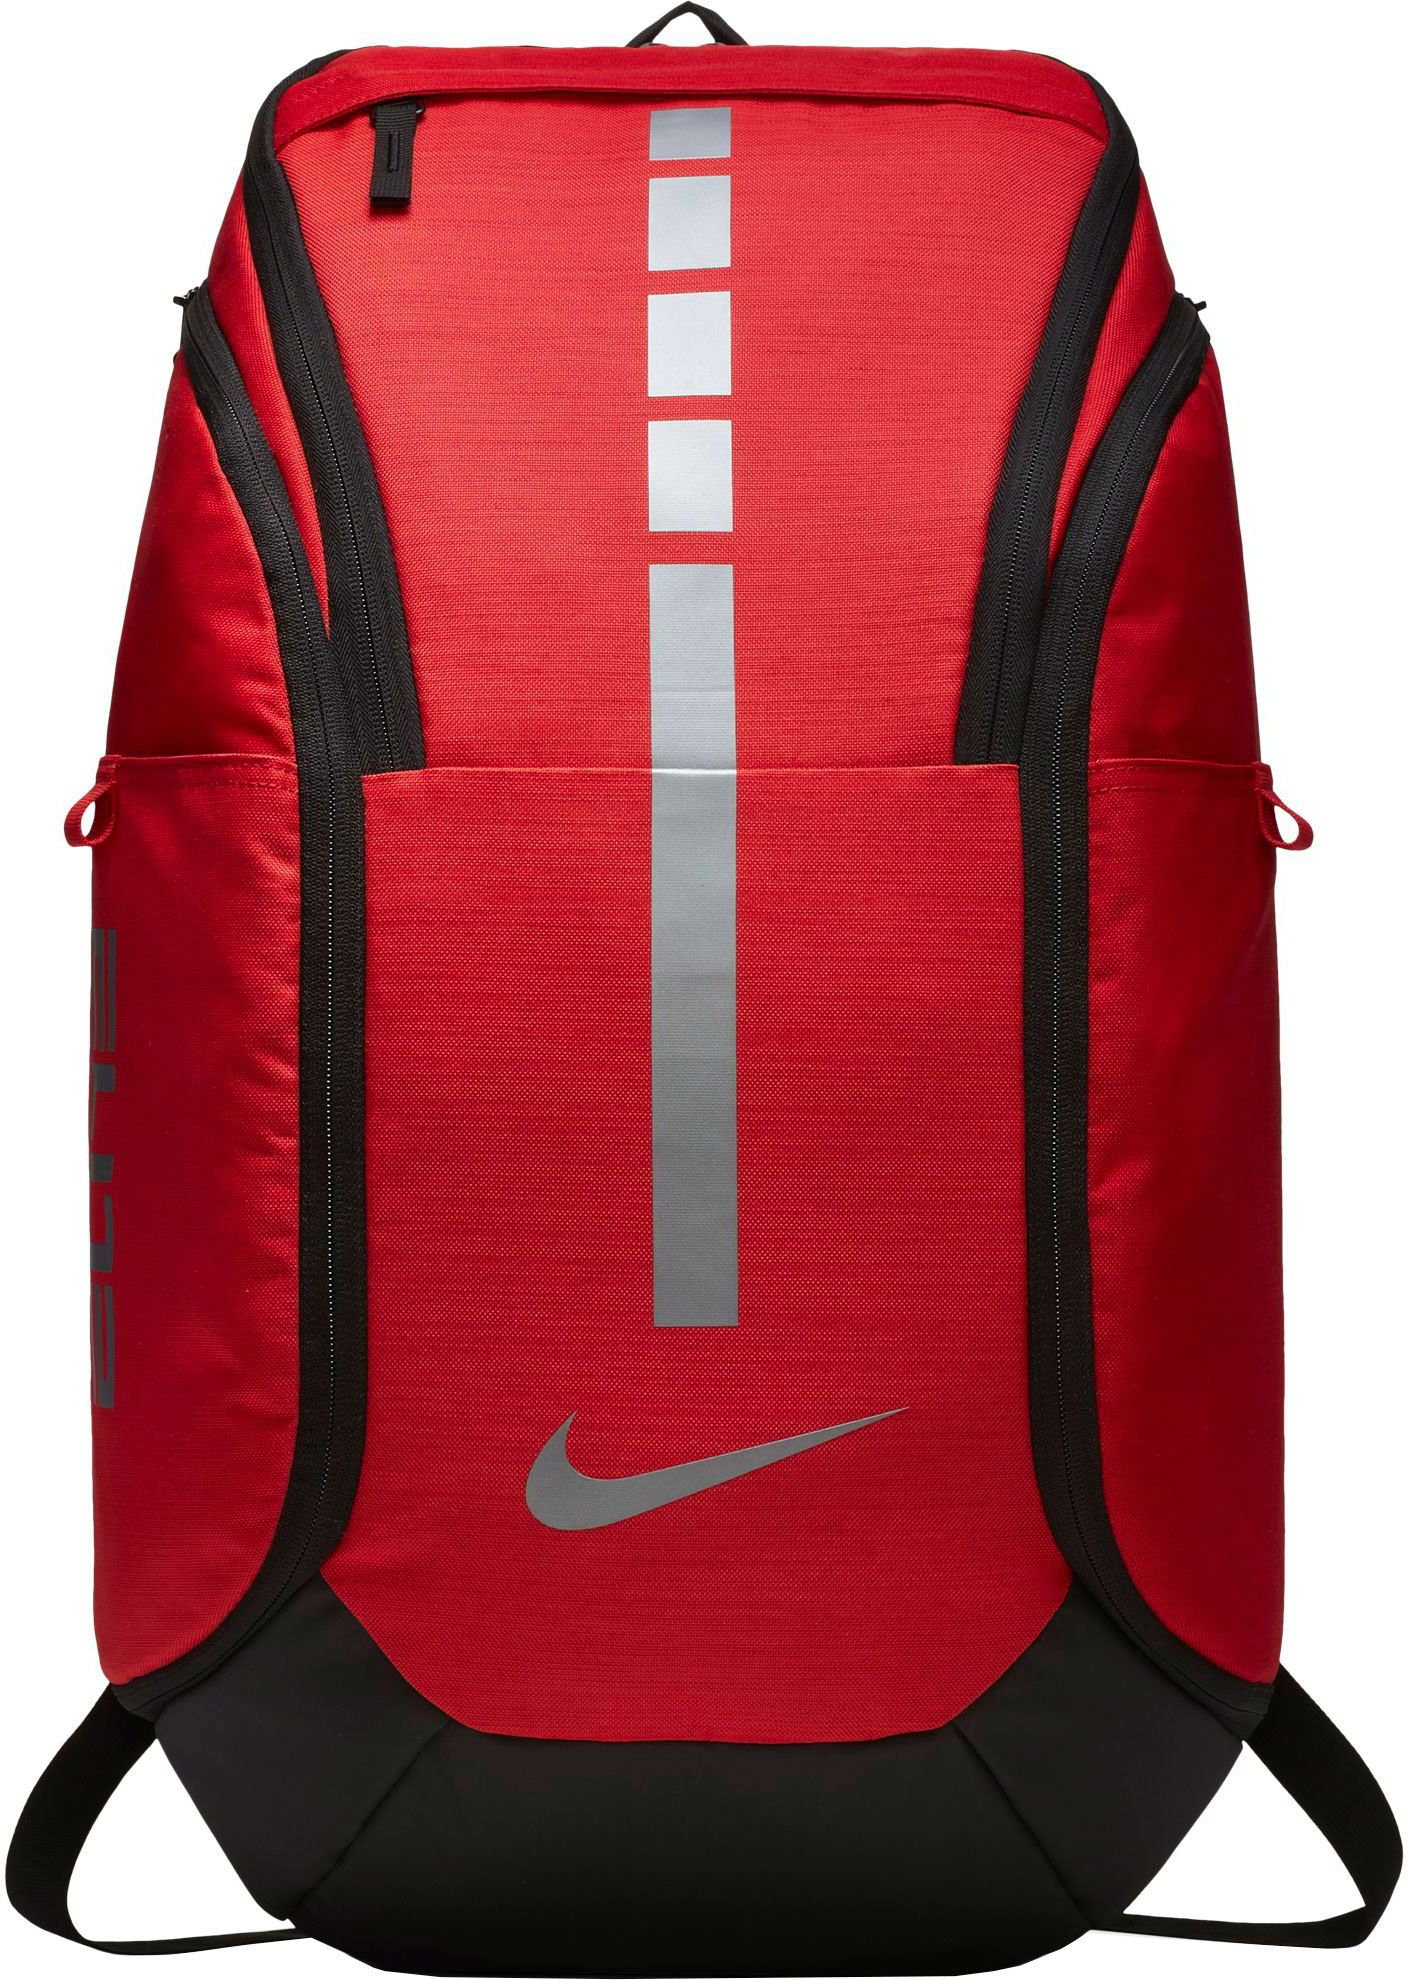 Nike Hoops Elite Pro Basketball Backpack  7ff70cffe